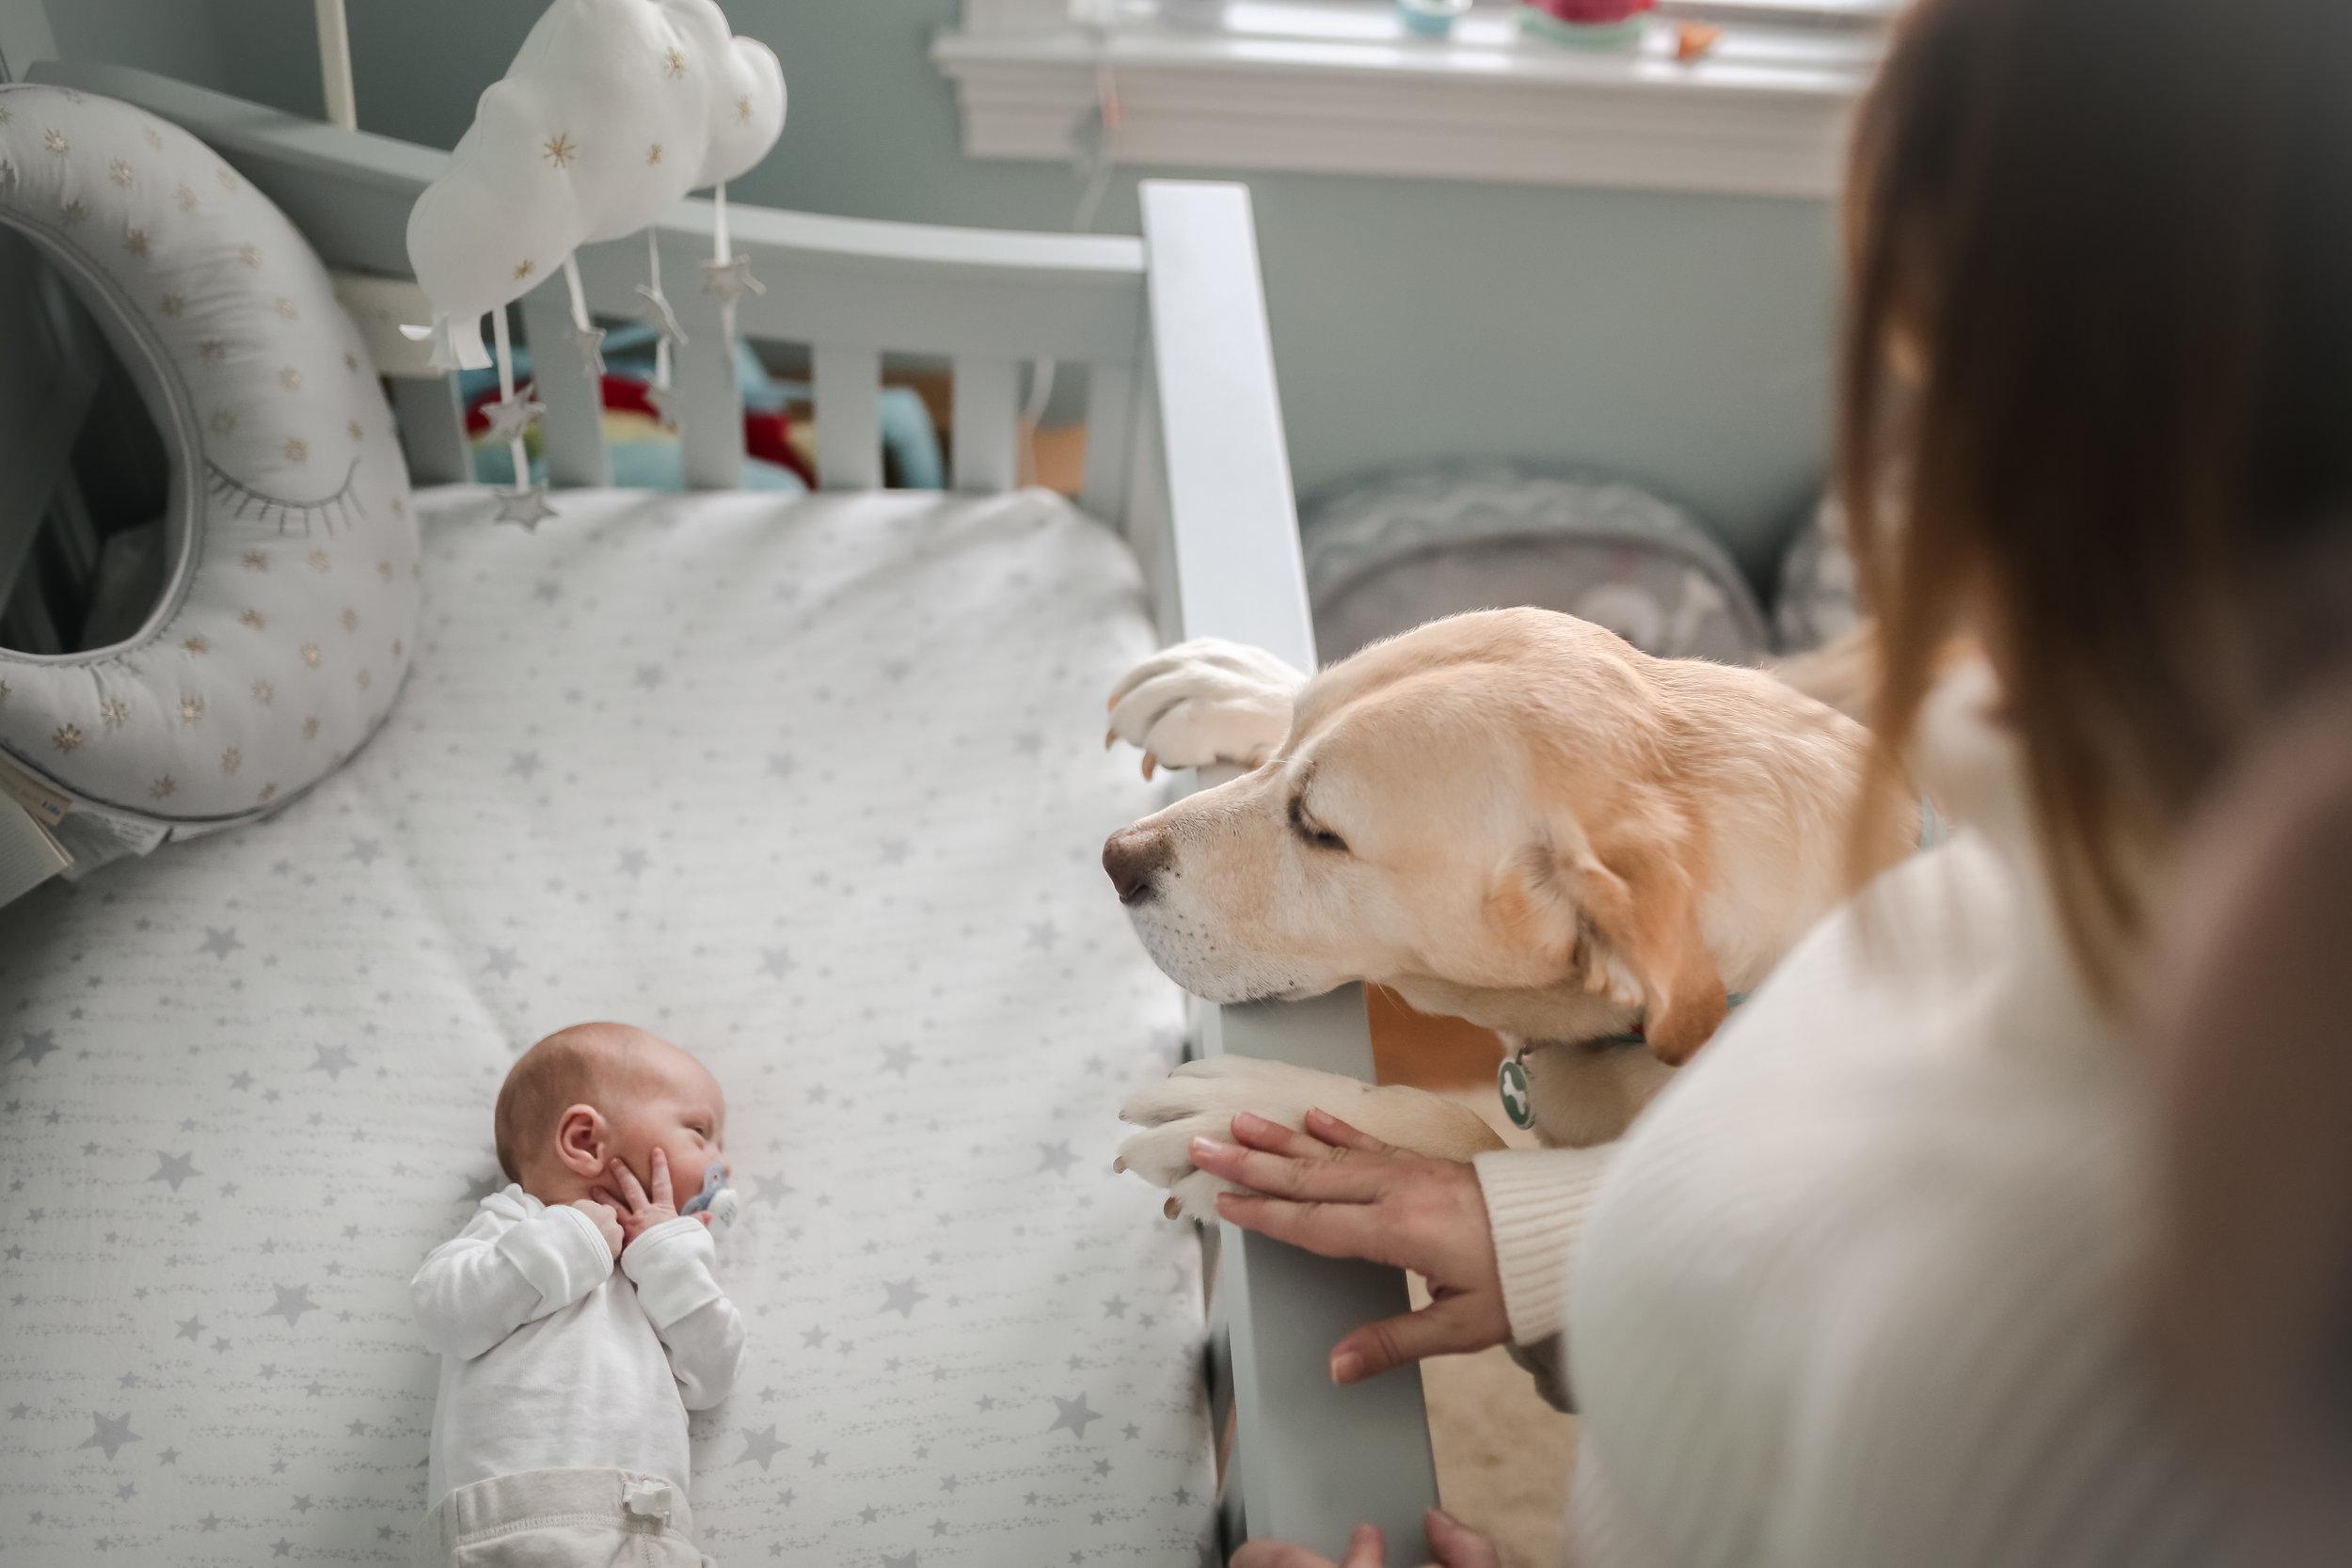 chicago lifestyle newborn photographer baby and dog